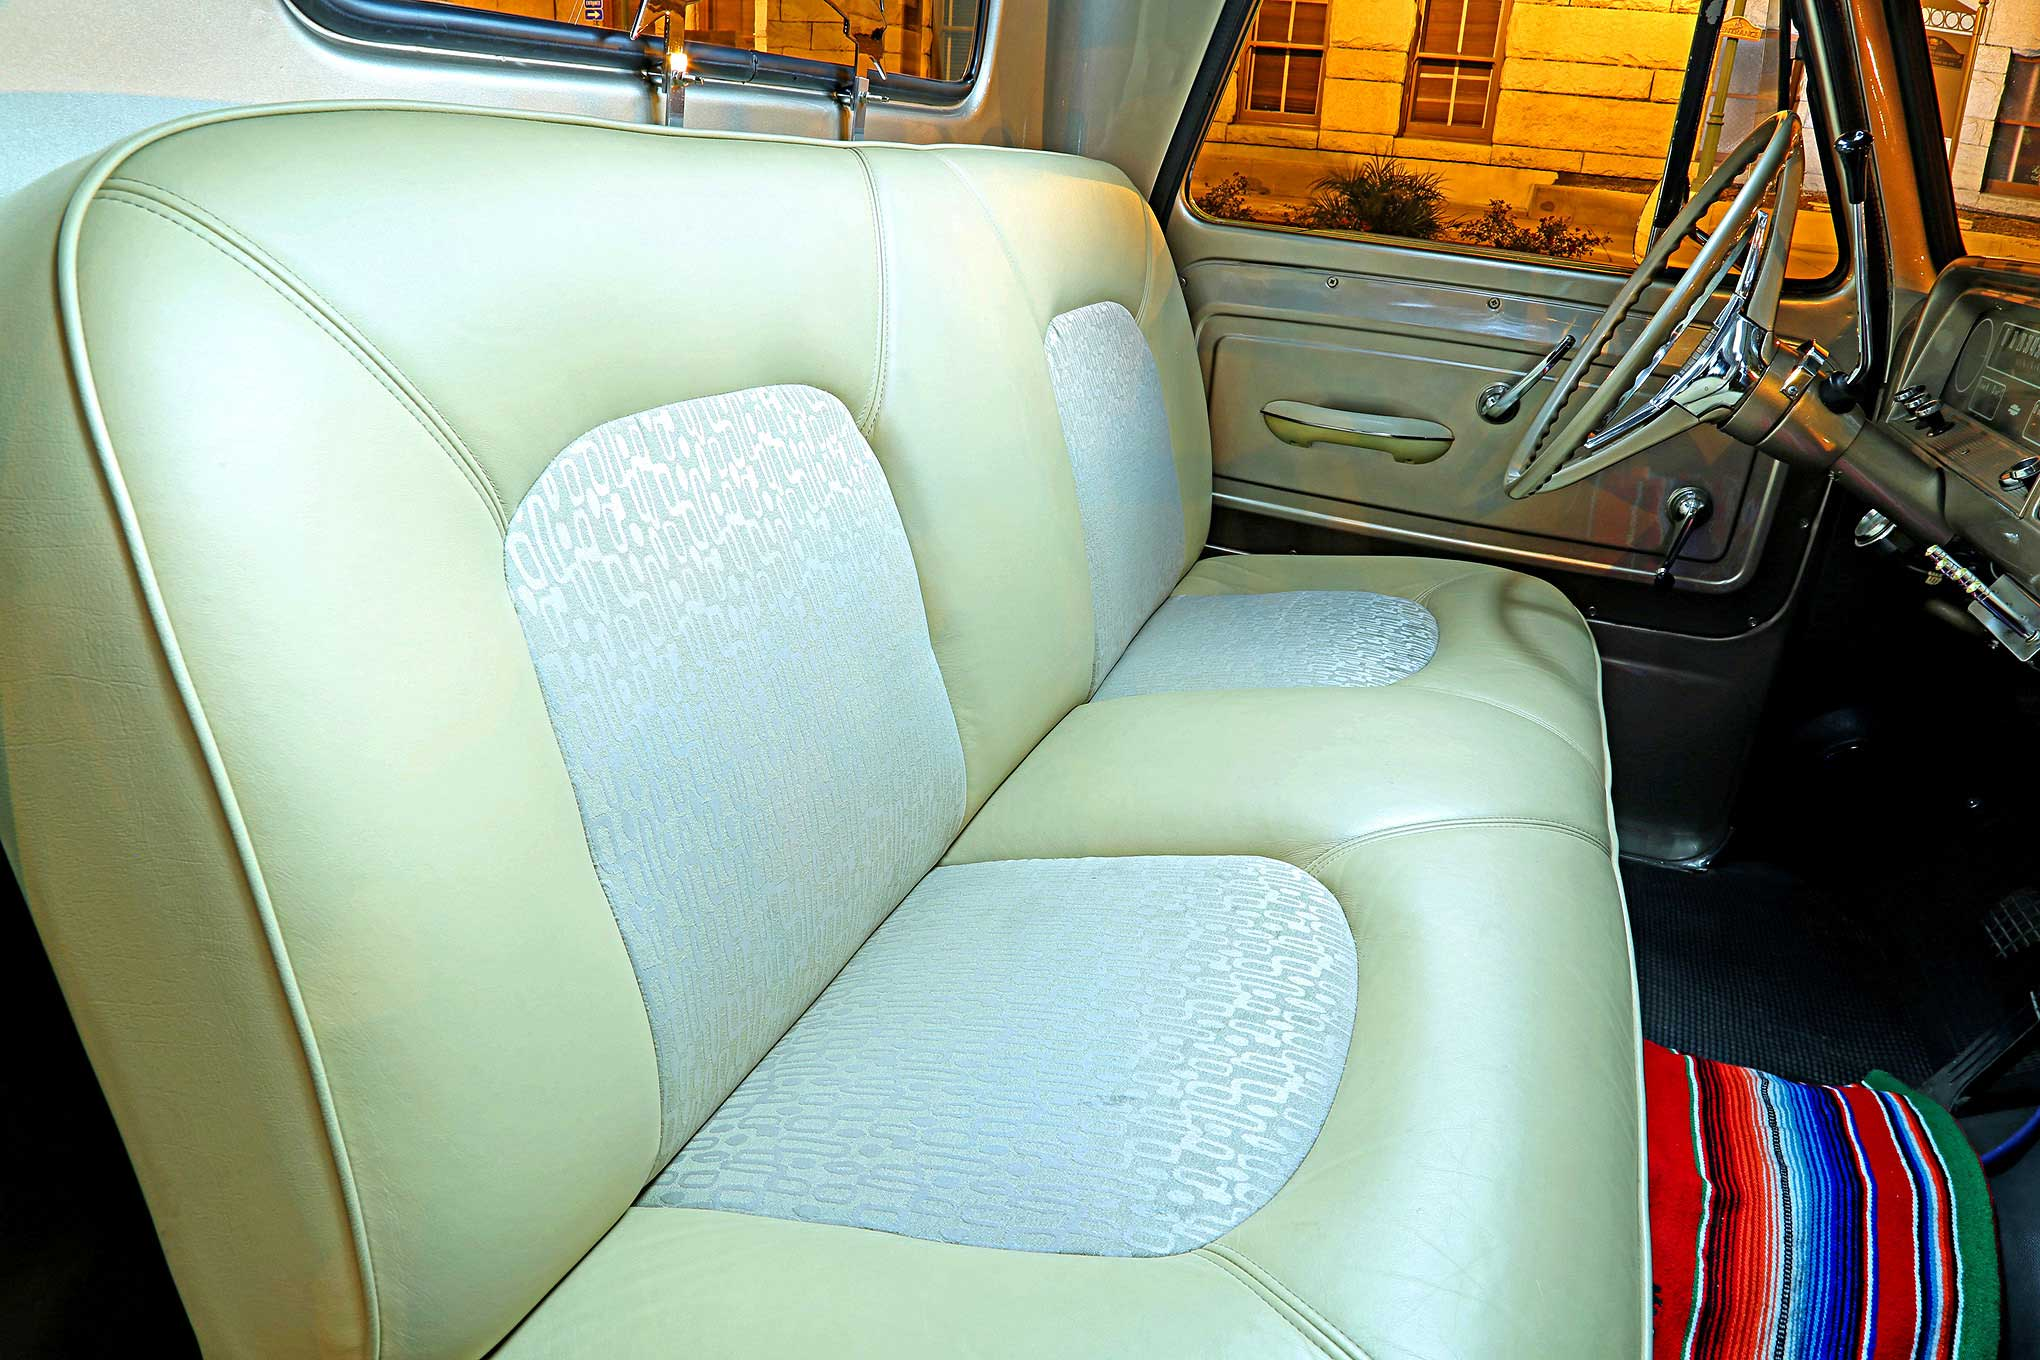 Swell 1964 Chevrolet C10 Tan Leather Bench Seat Lowrider Short Links Chair Design For Home Short Linksinfo